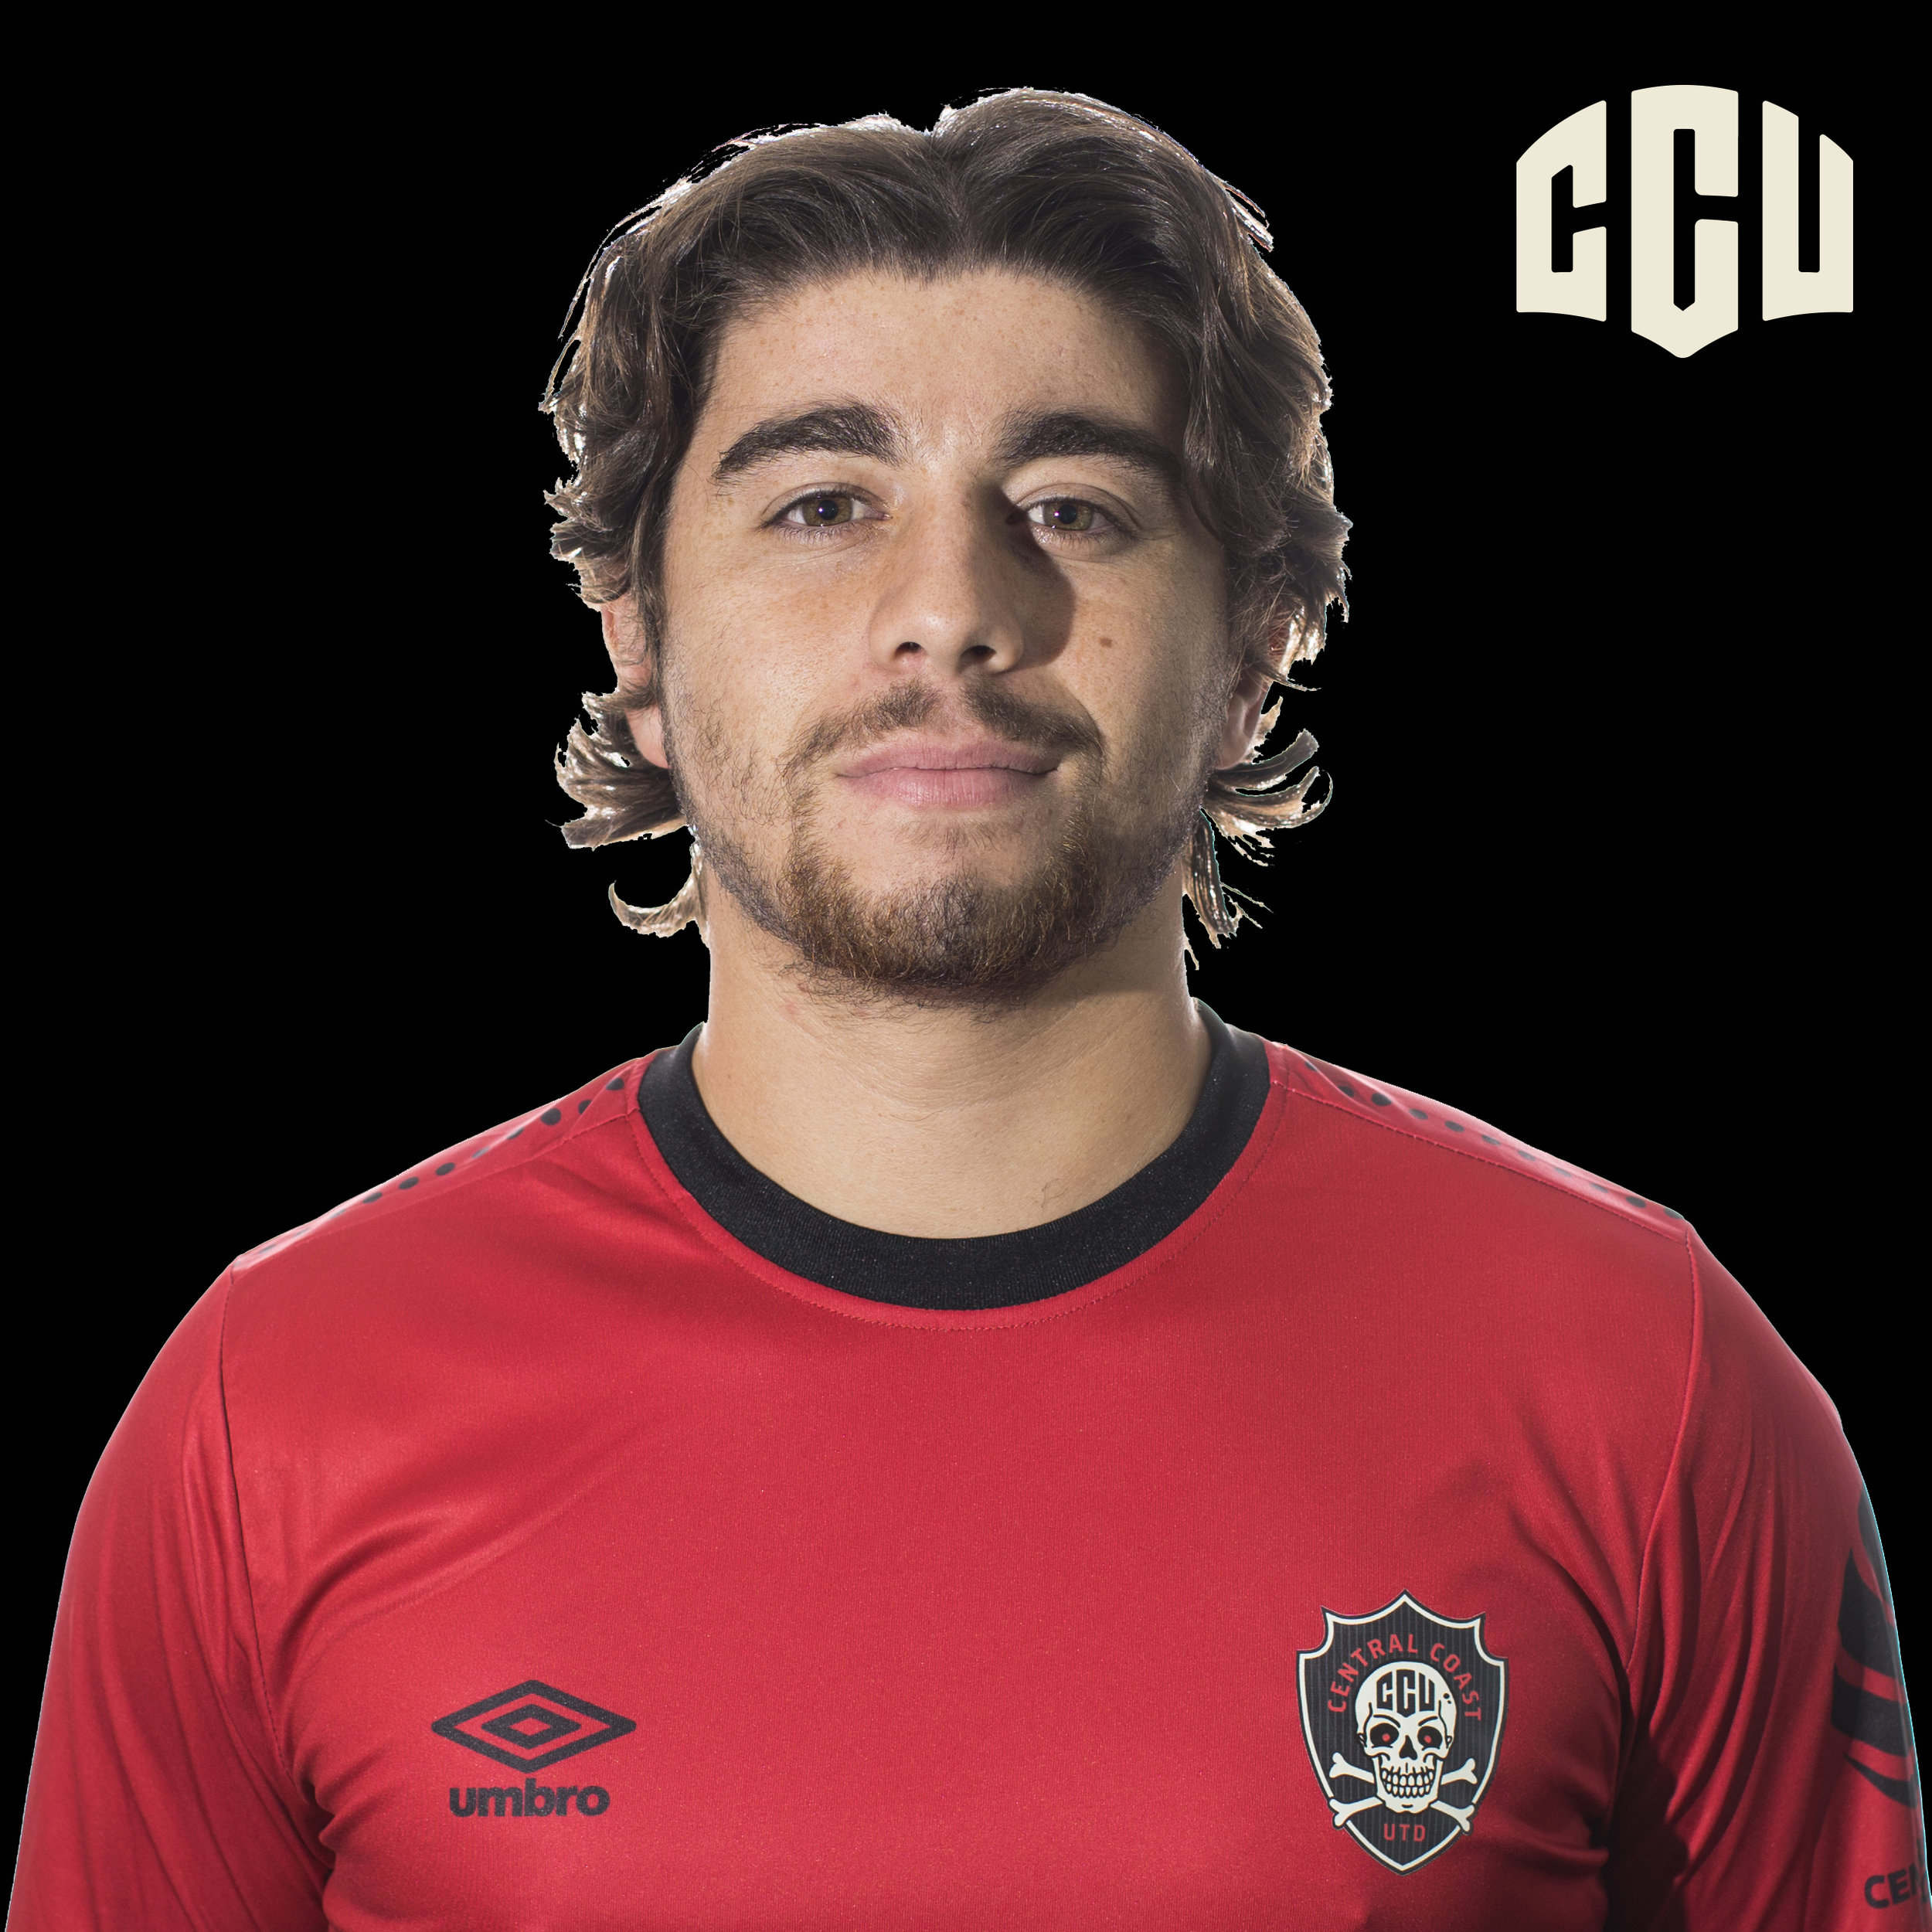 Alex Arbelo